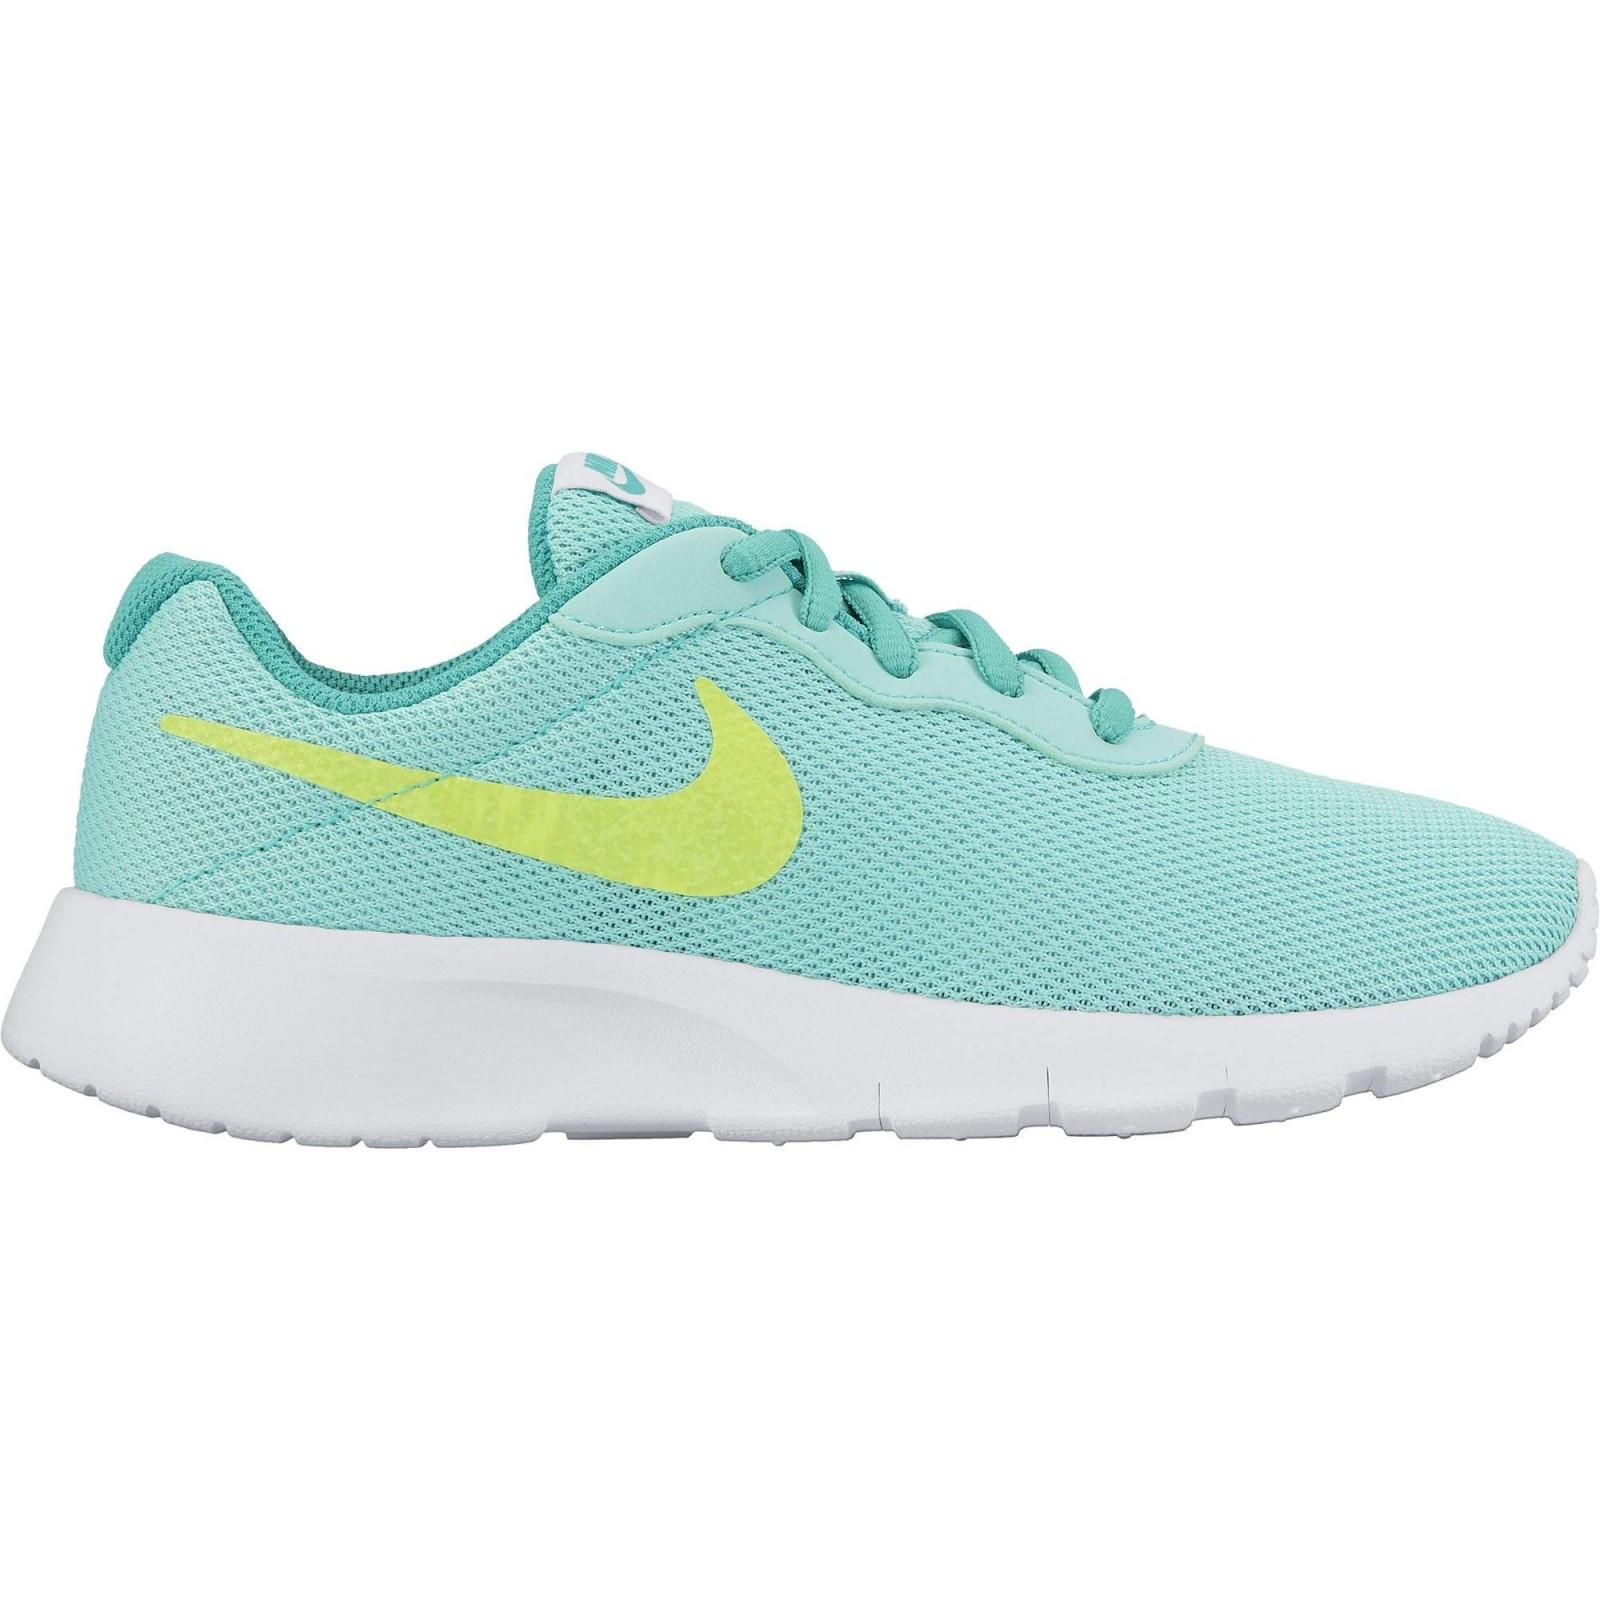 Dětské boty Nike TANJUN (GS)  042c002273